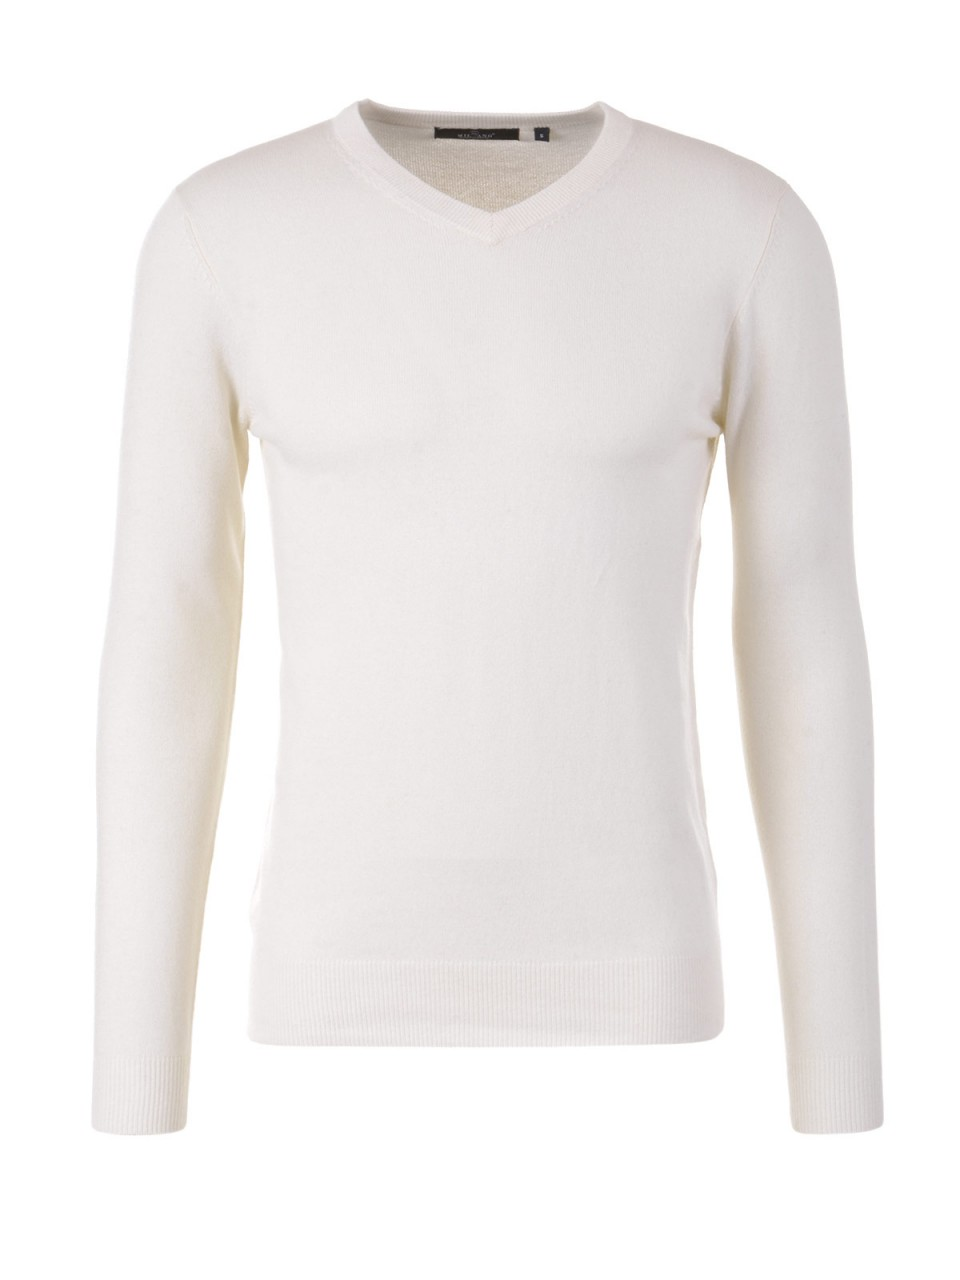 milano-italy-herren-pullover-creme